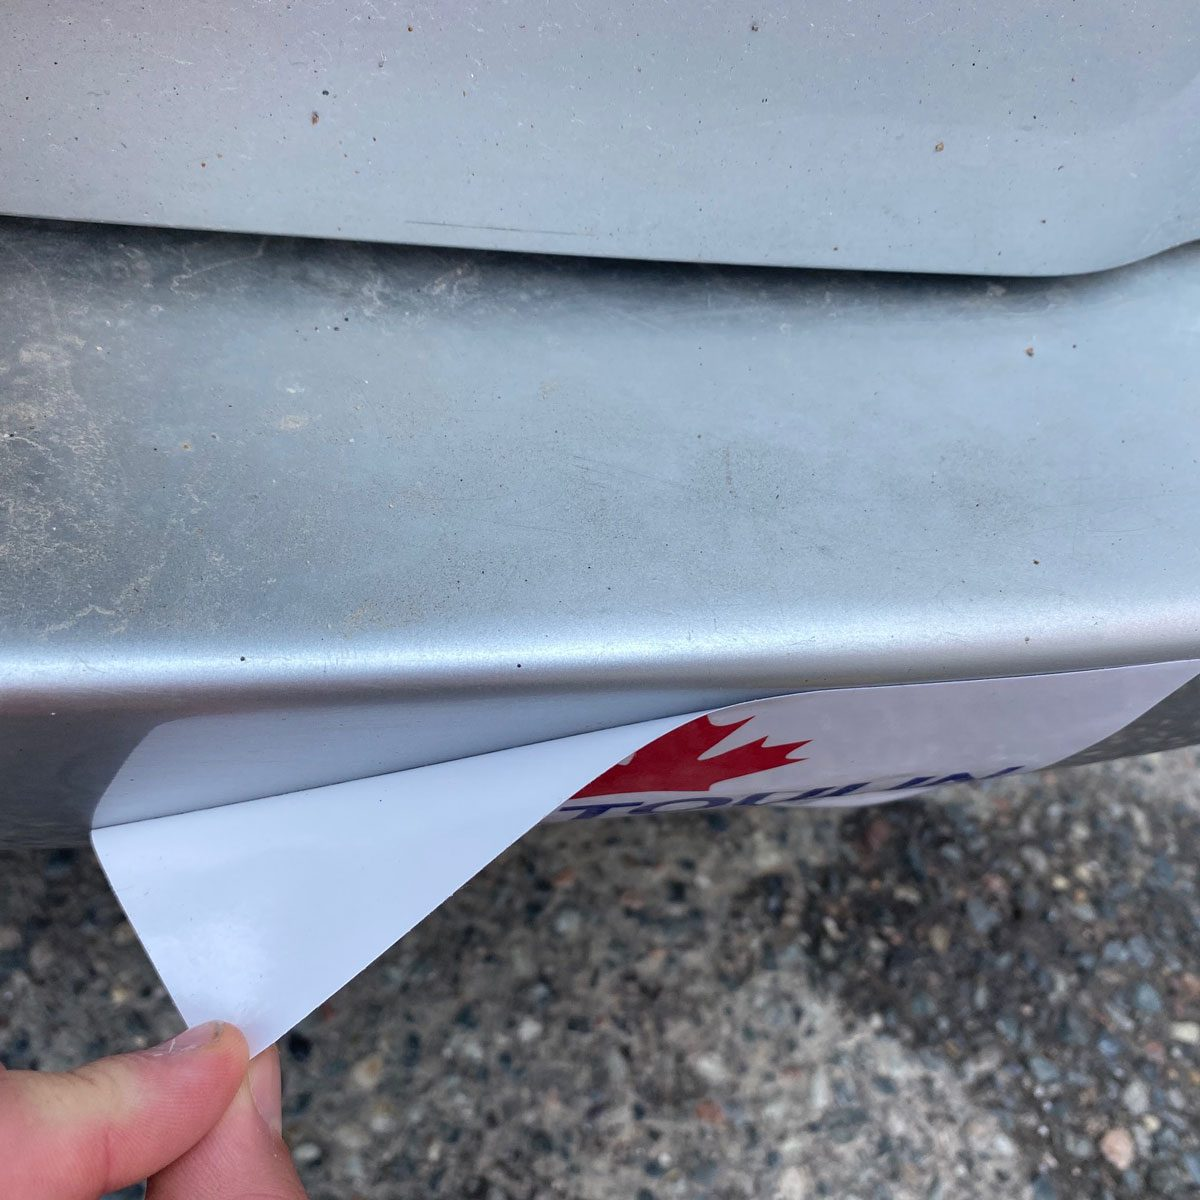 Peel Off the Sticker